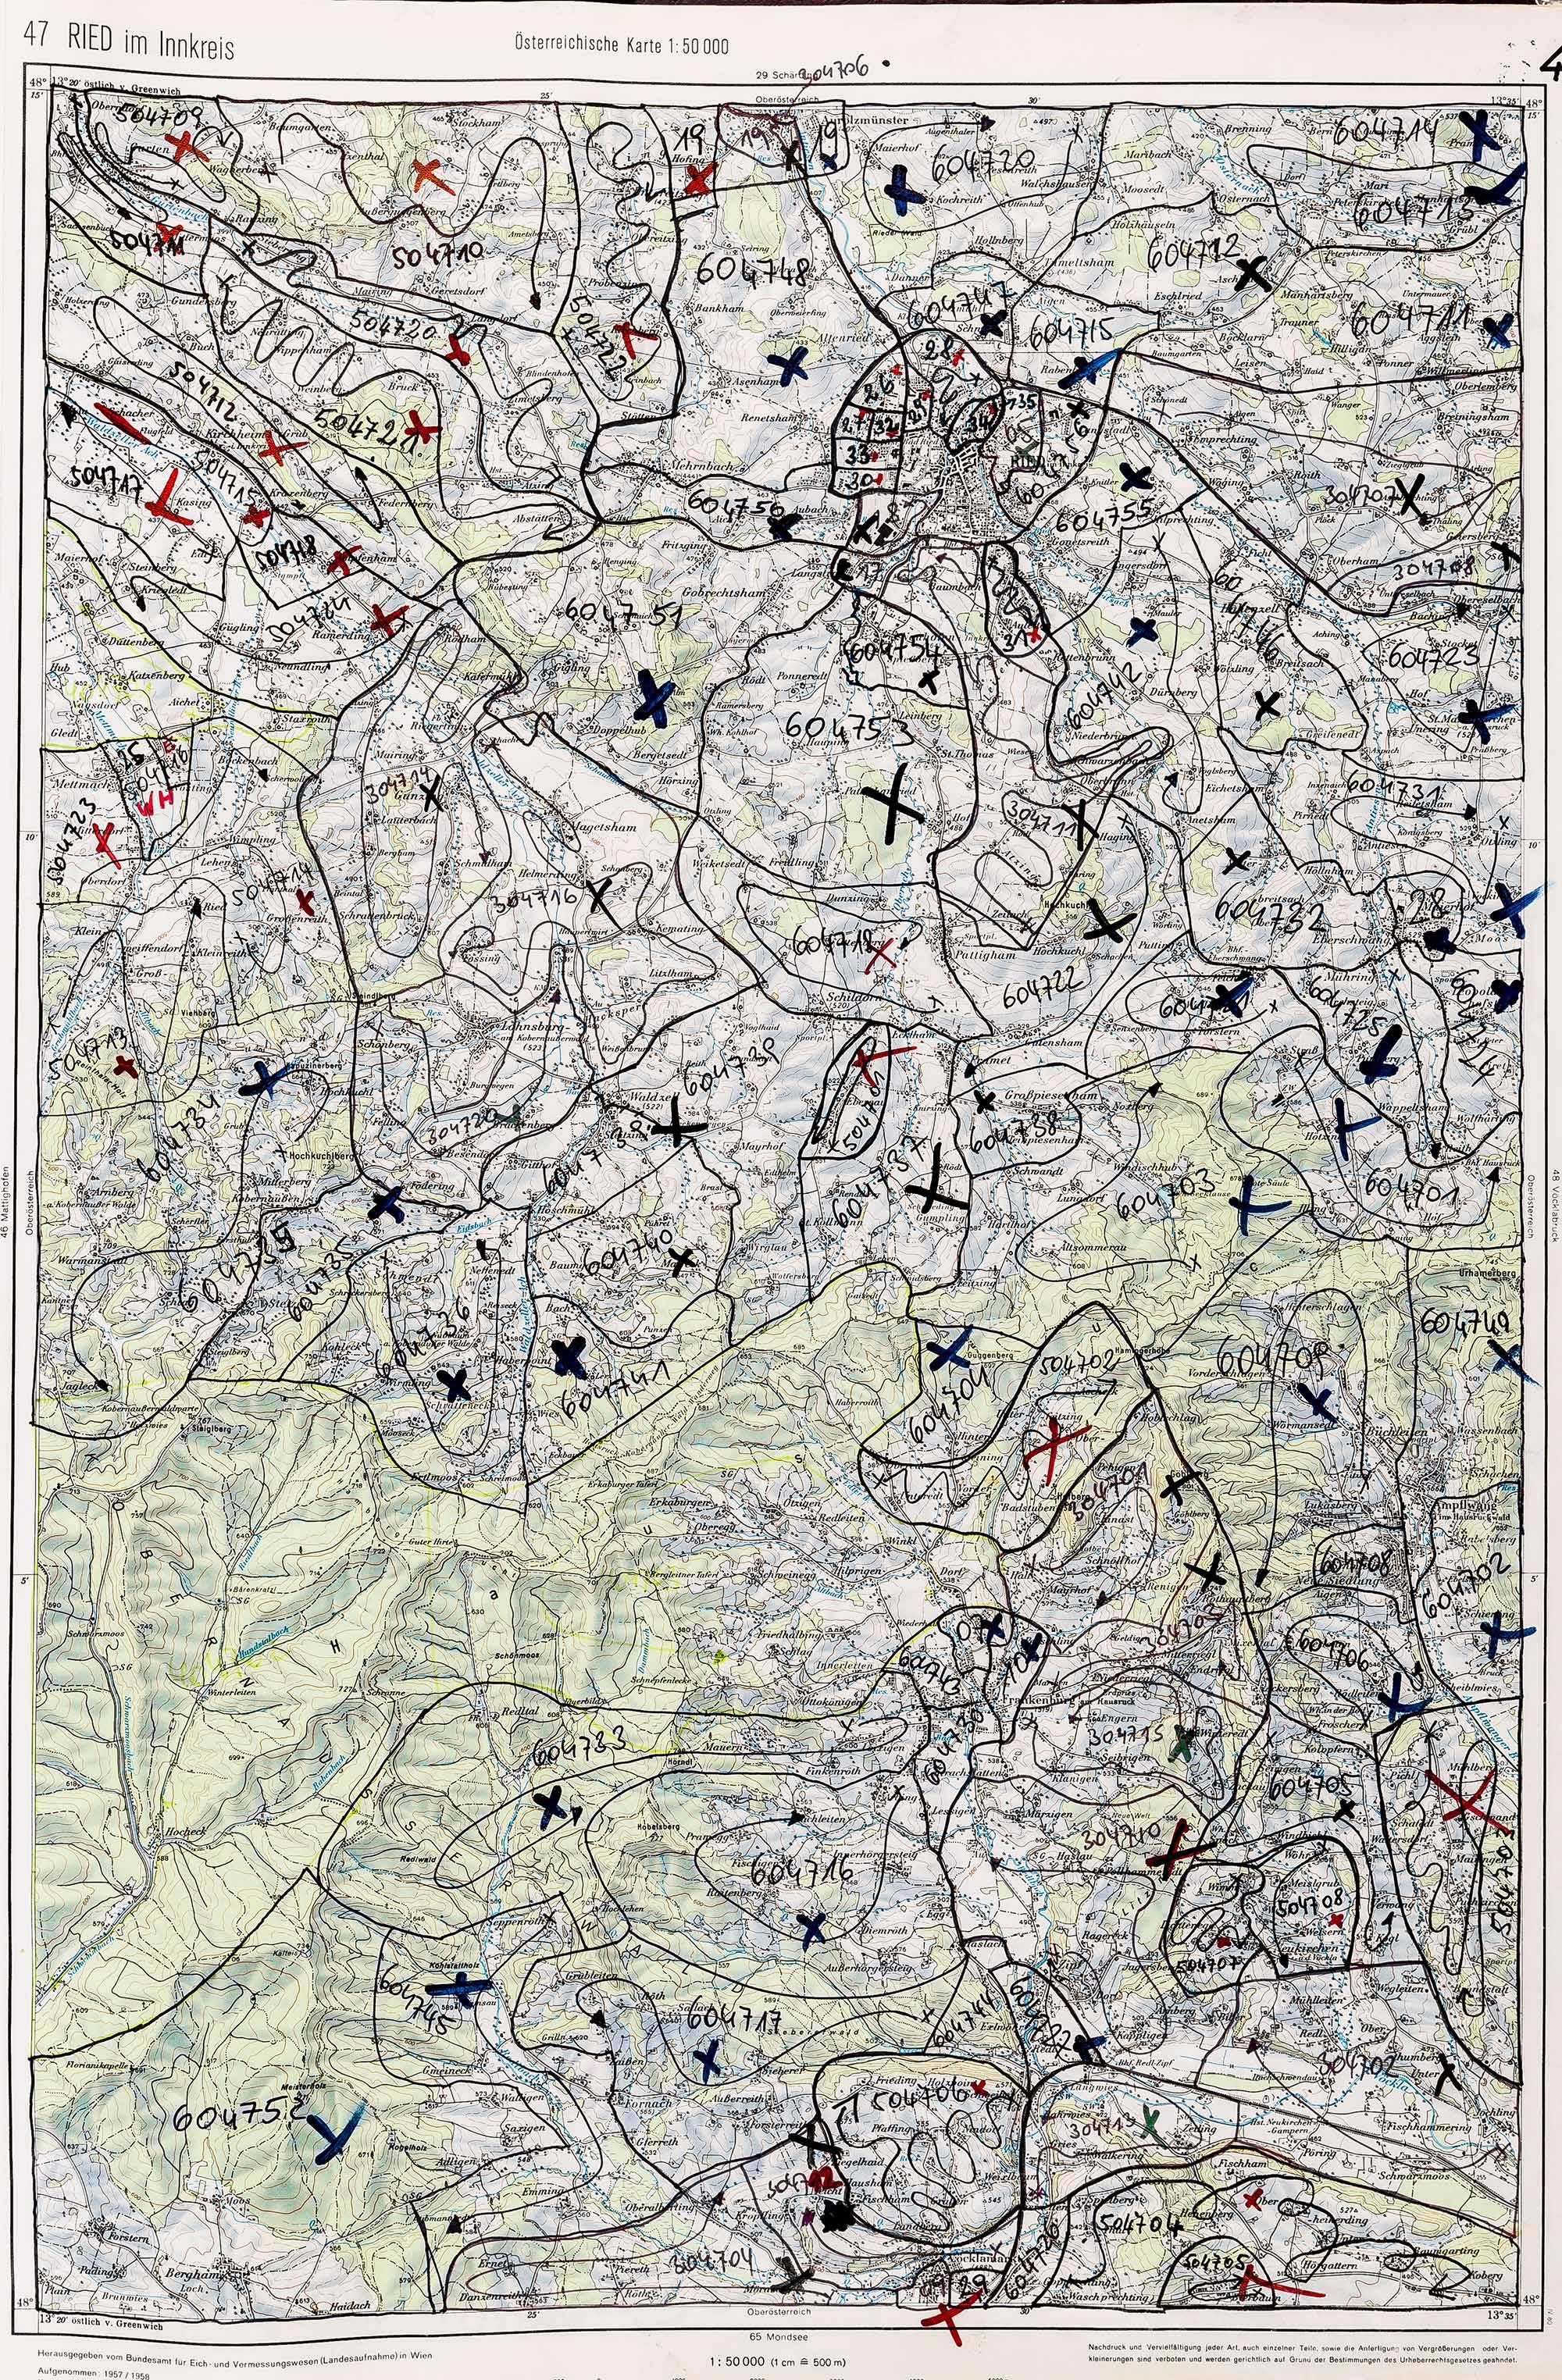 1983-1986 Karte 047